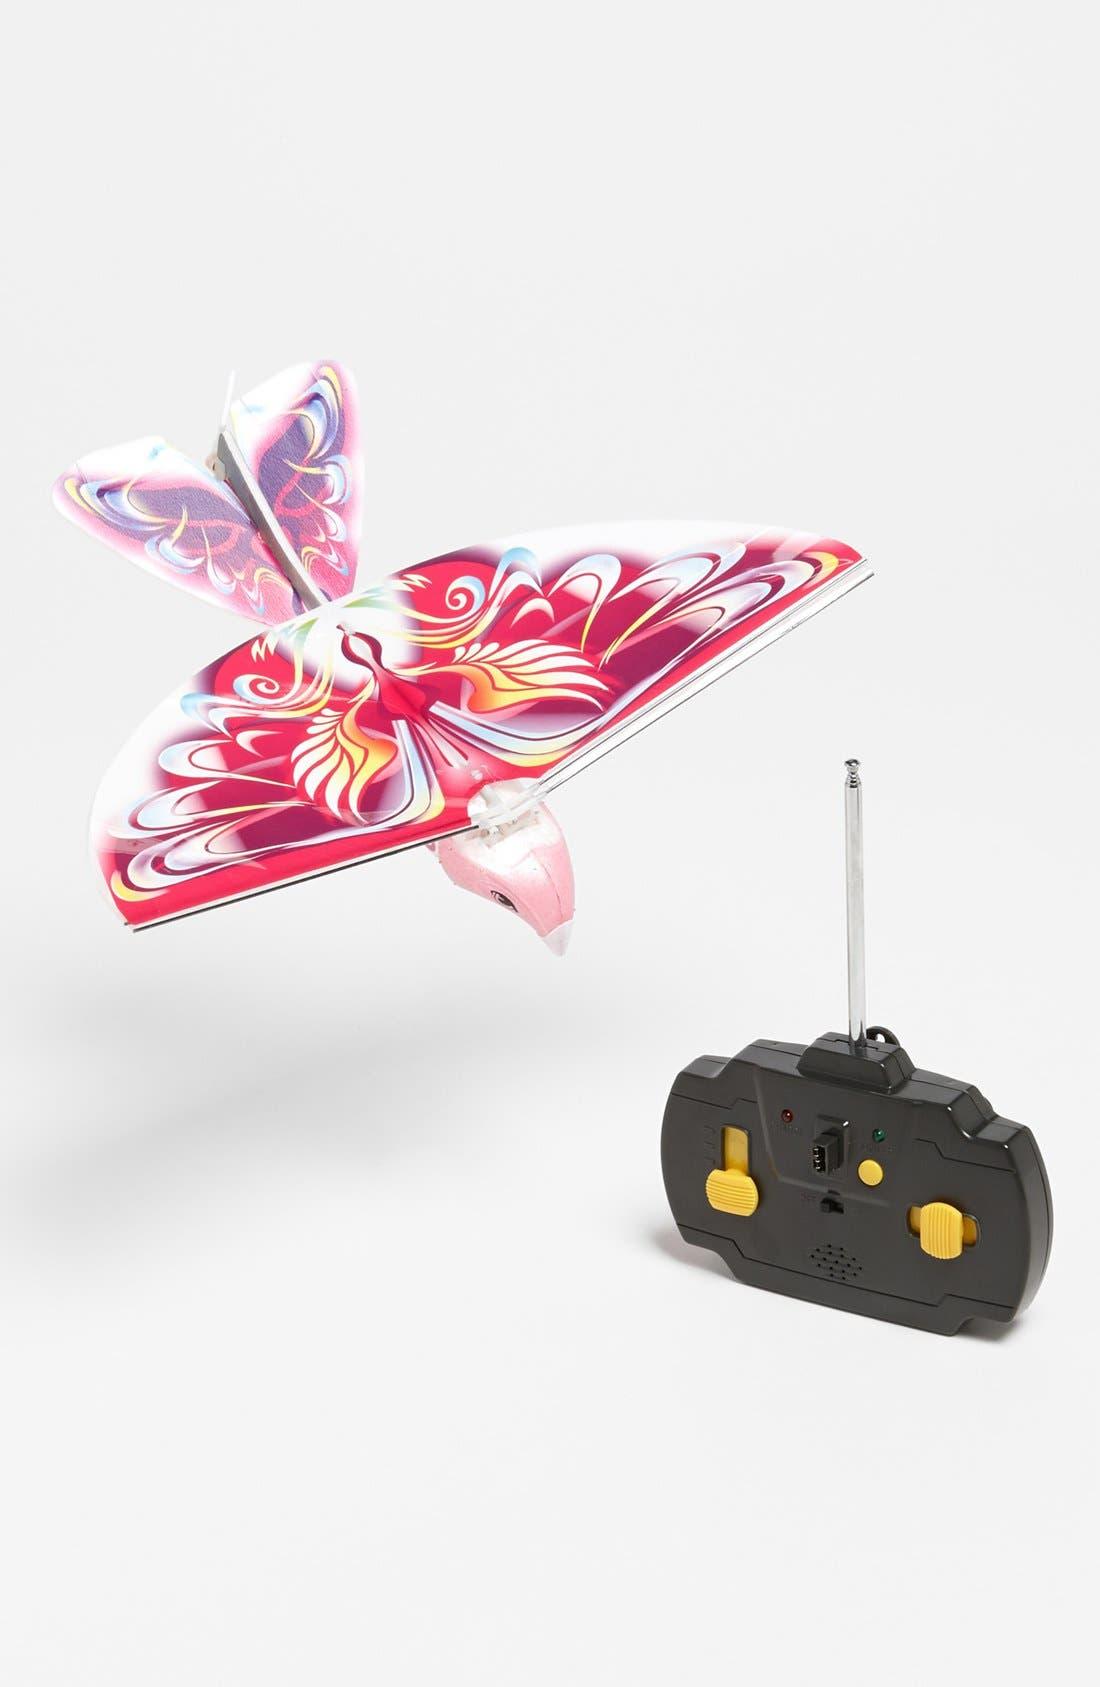 Main Image - MukikiM Remote Control Bird